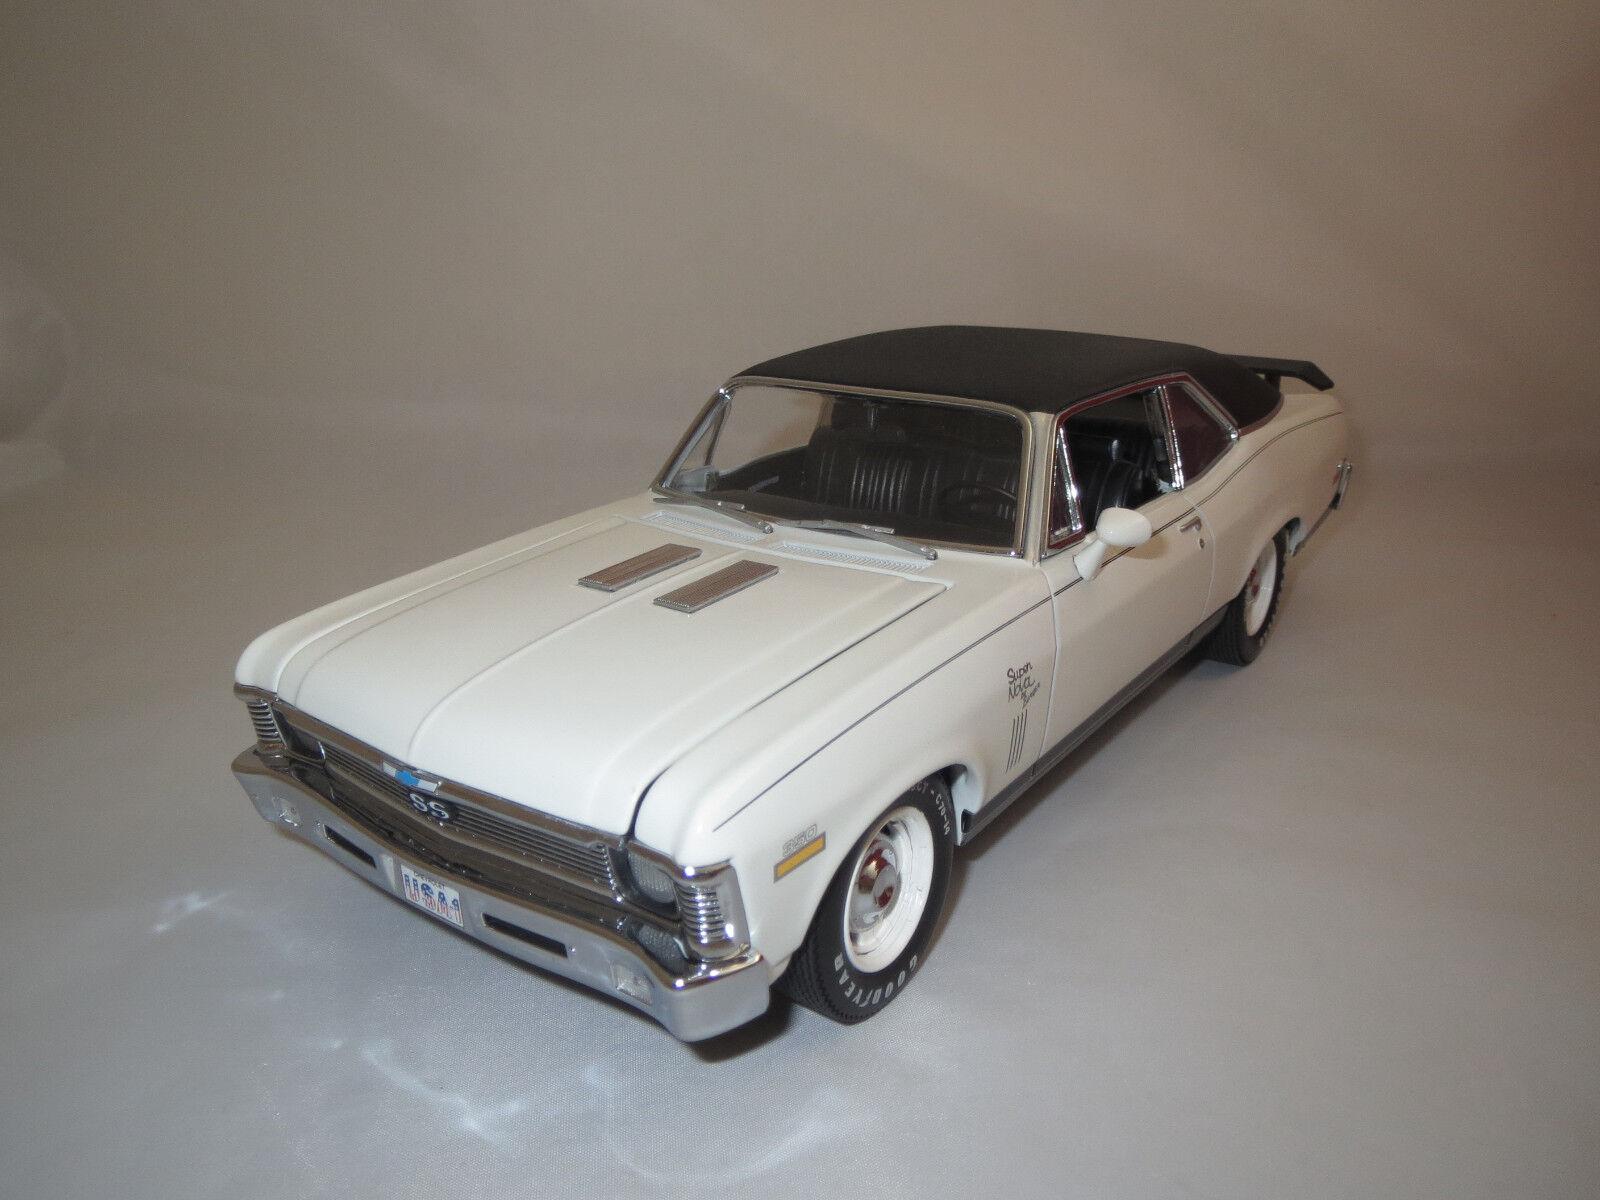 GMP CHEVROLET super nova  1970  (Blanc) 1 18 sans emballage